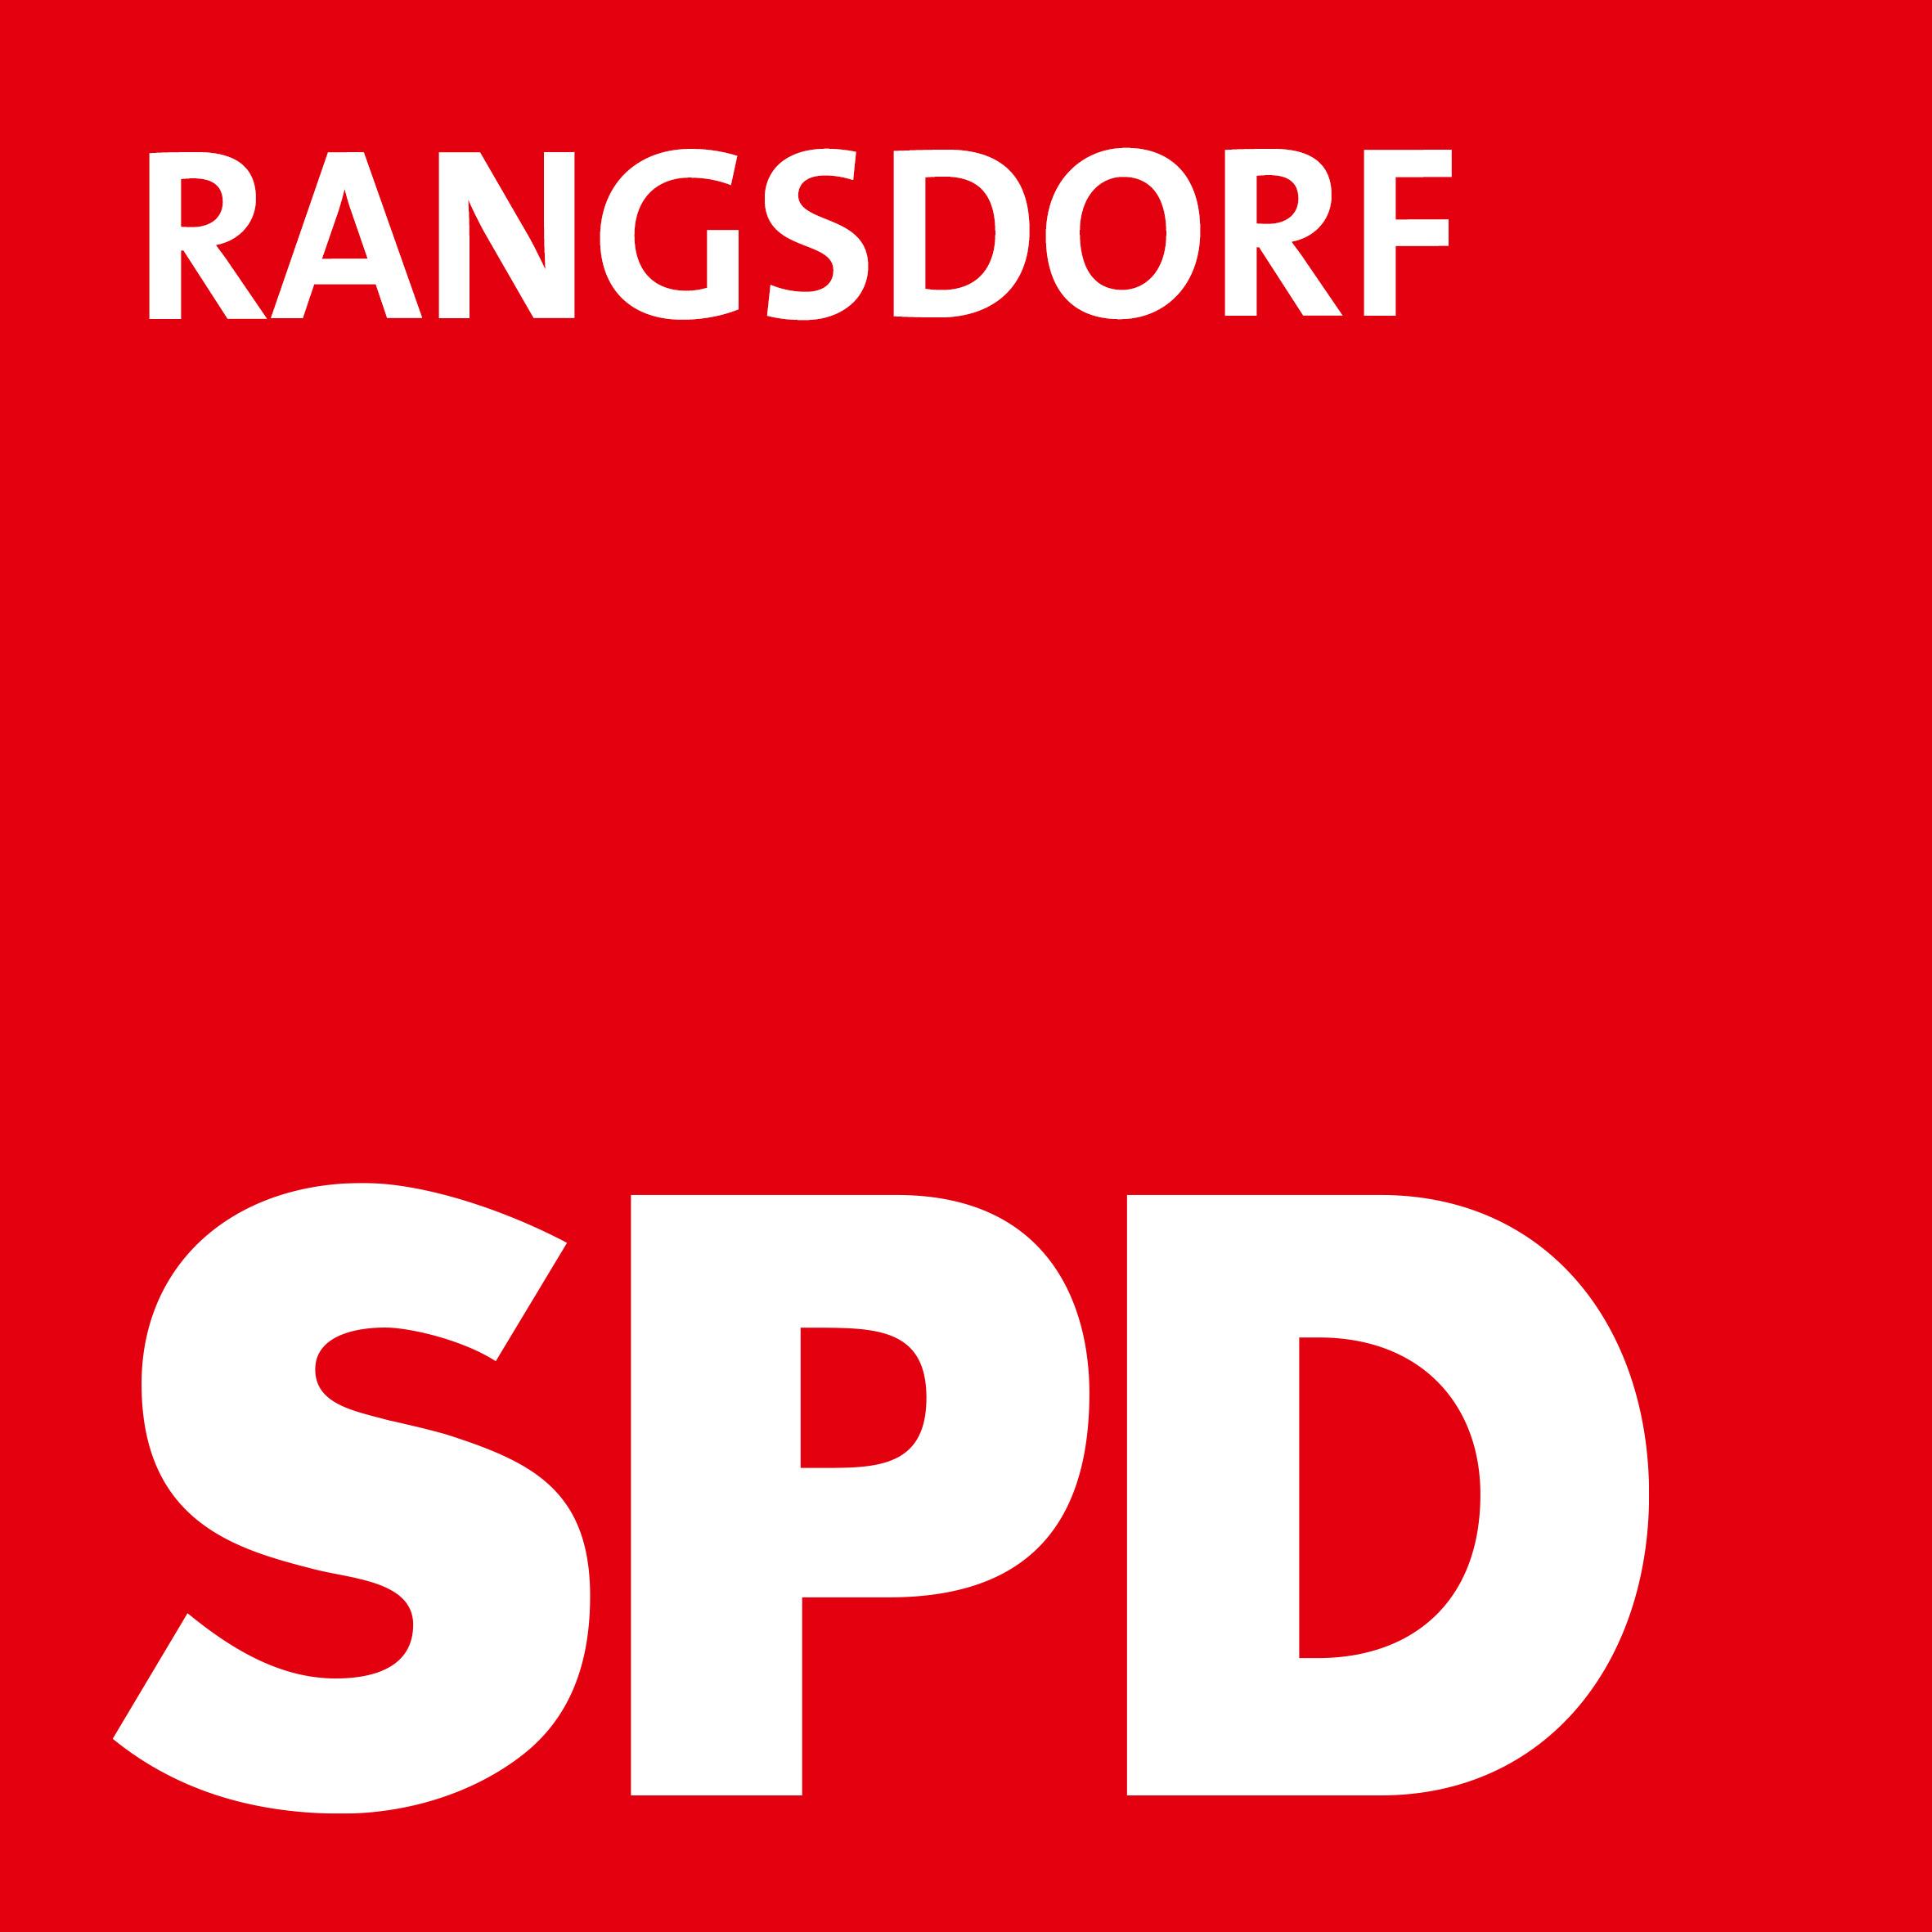 SPD Rangsdorf